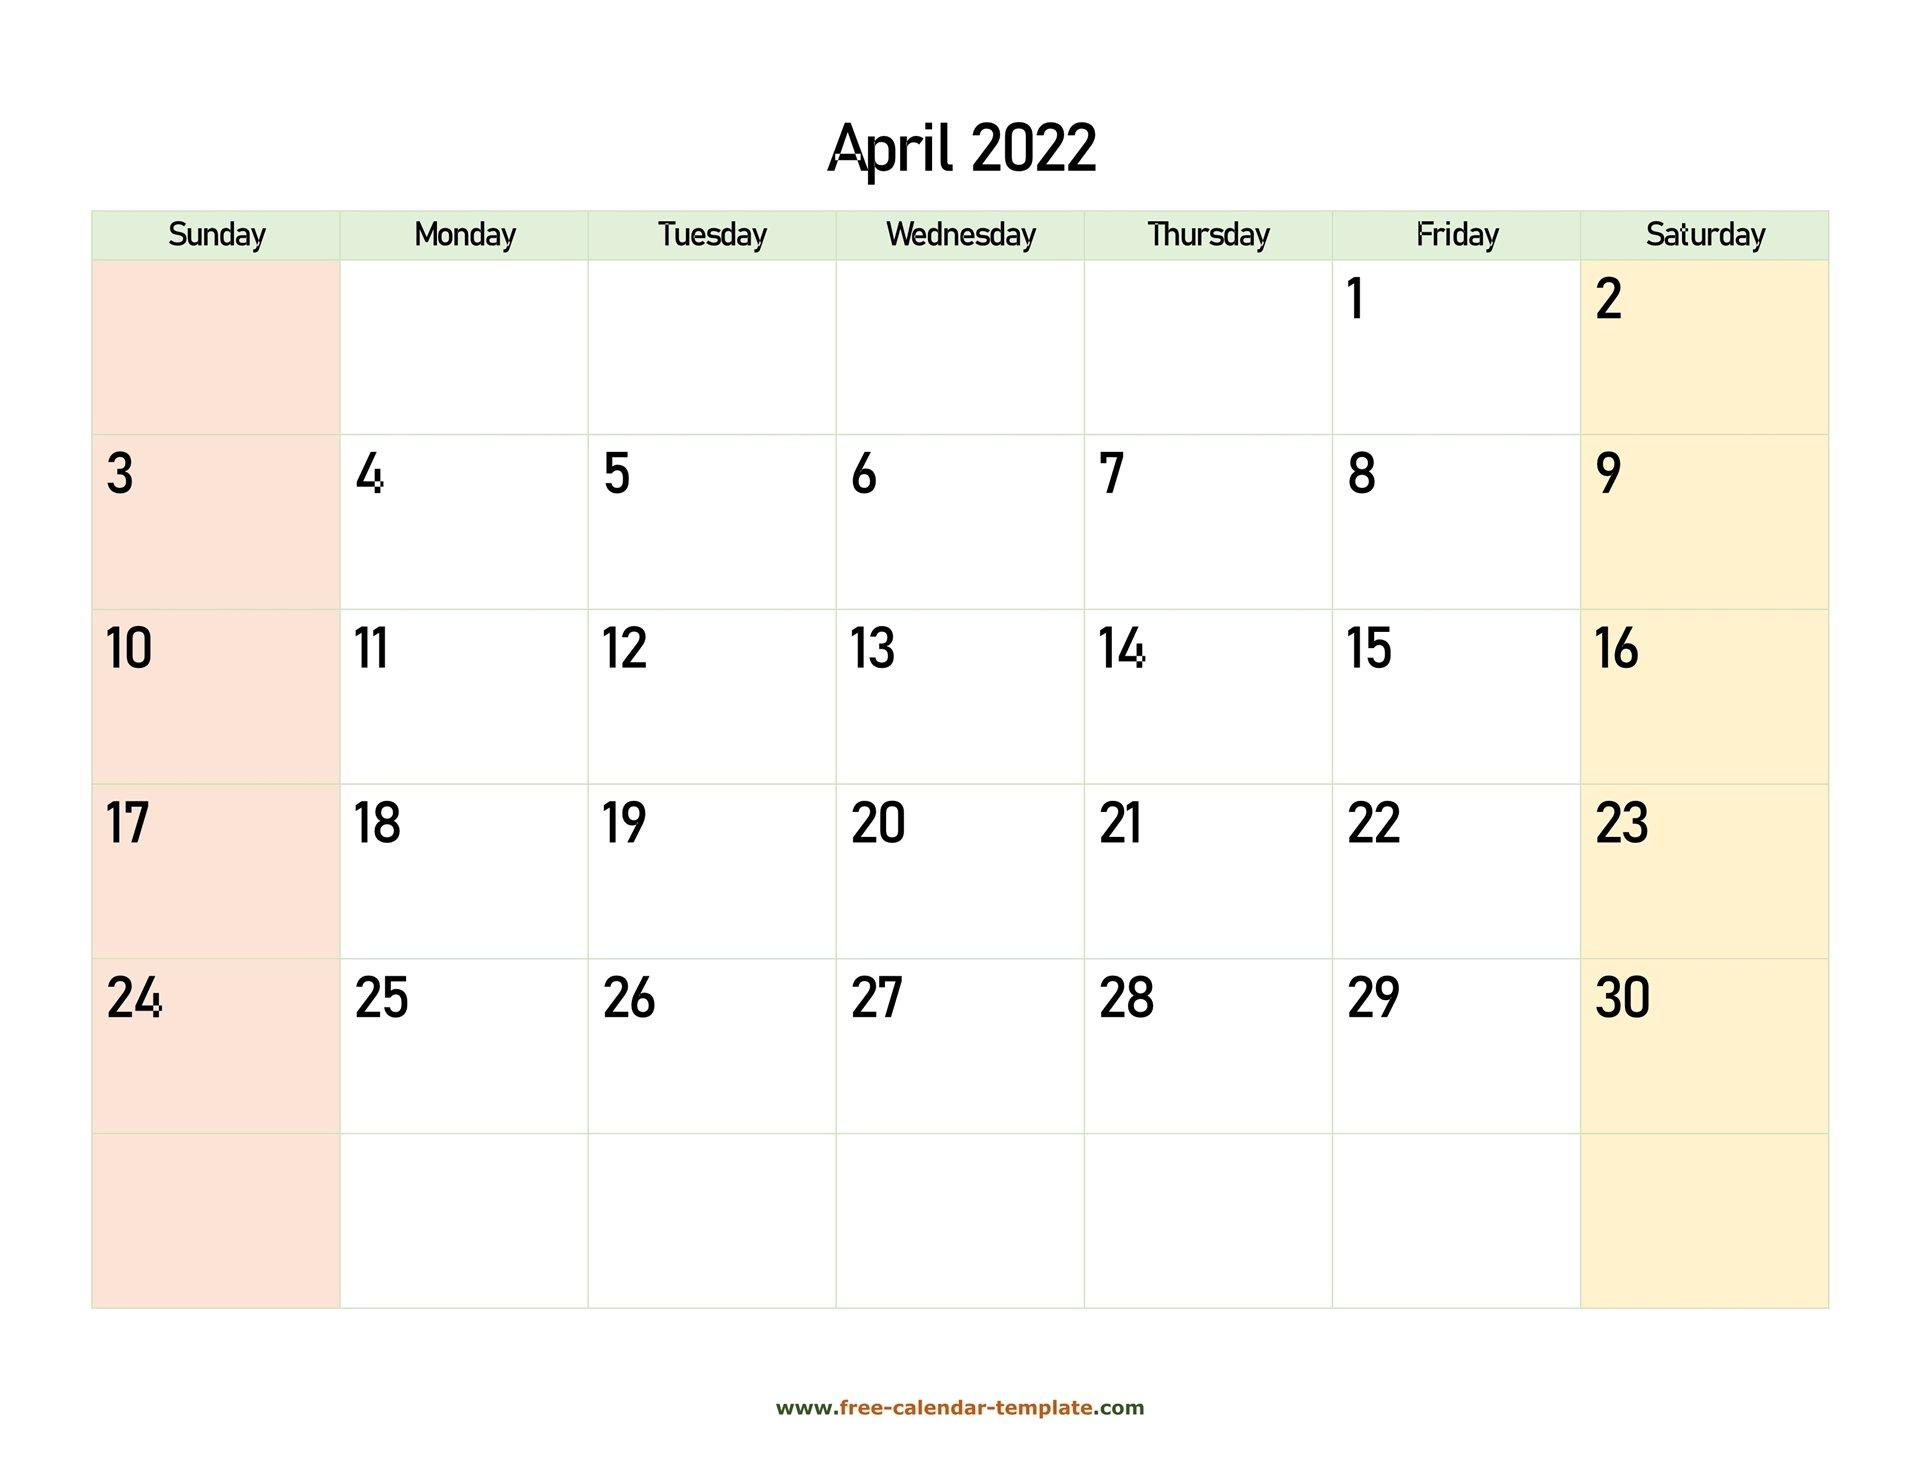 April 2022 Free Calendar Tempplate | Free-Calendar intended for Blank Calendar Printable April 2022